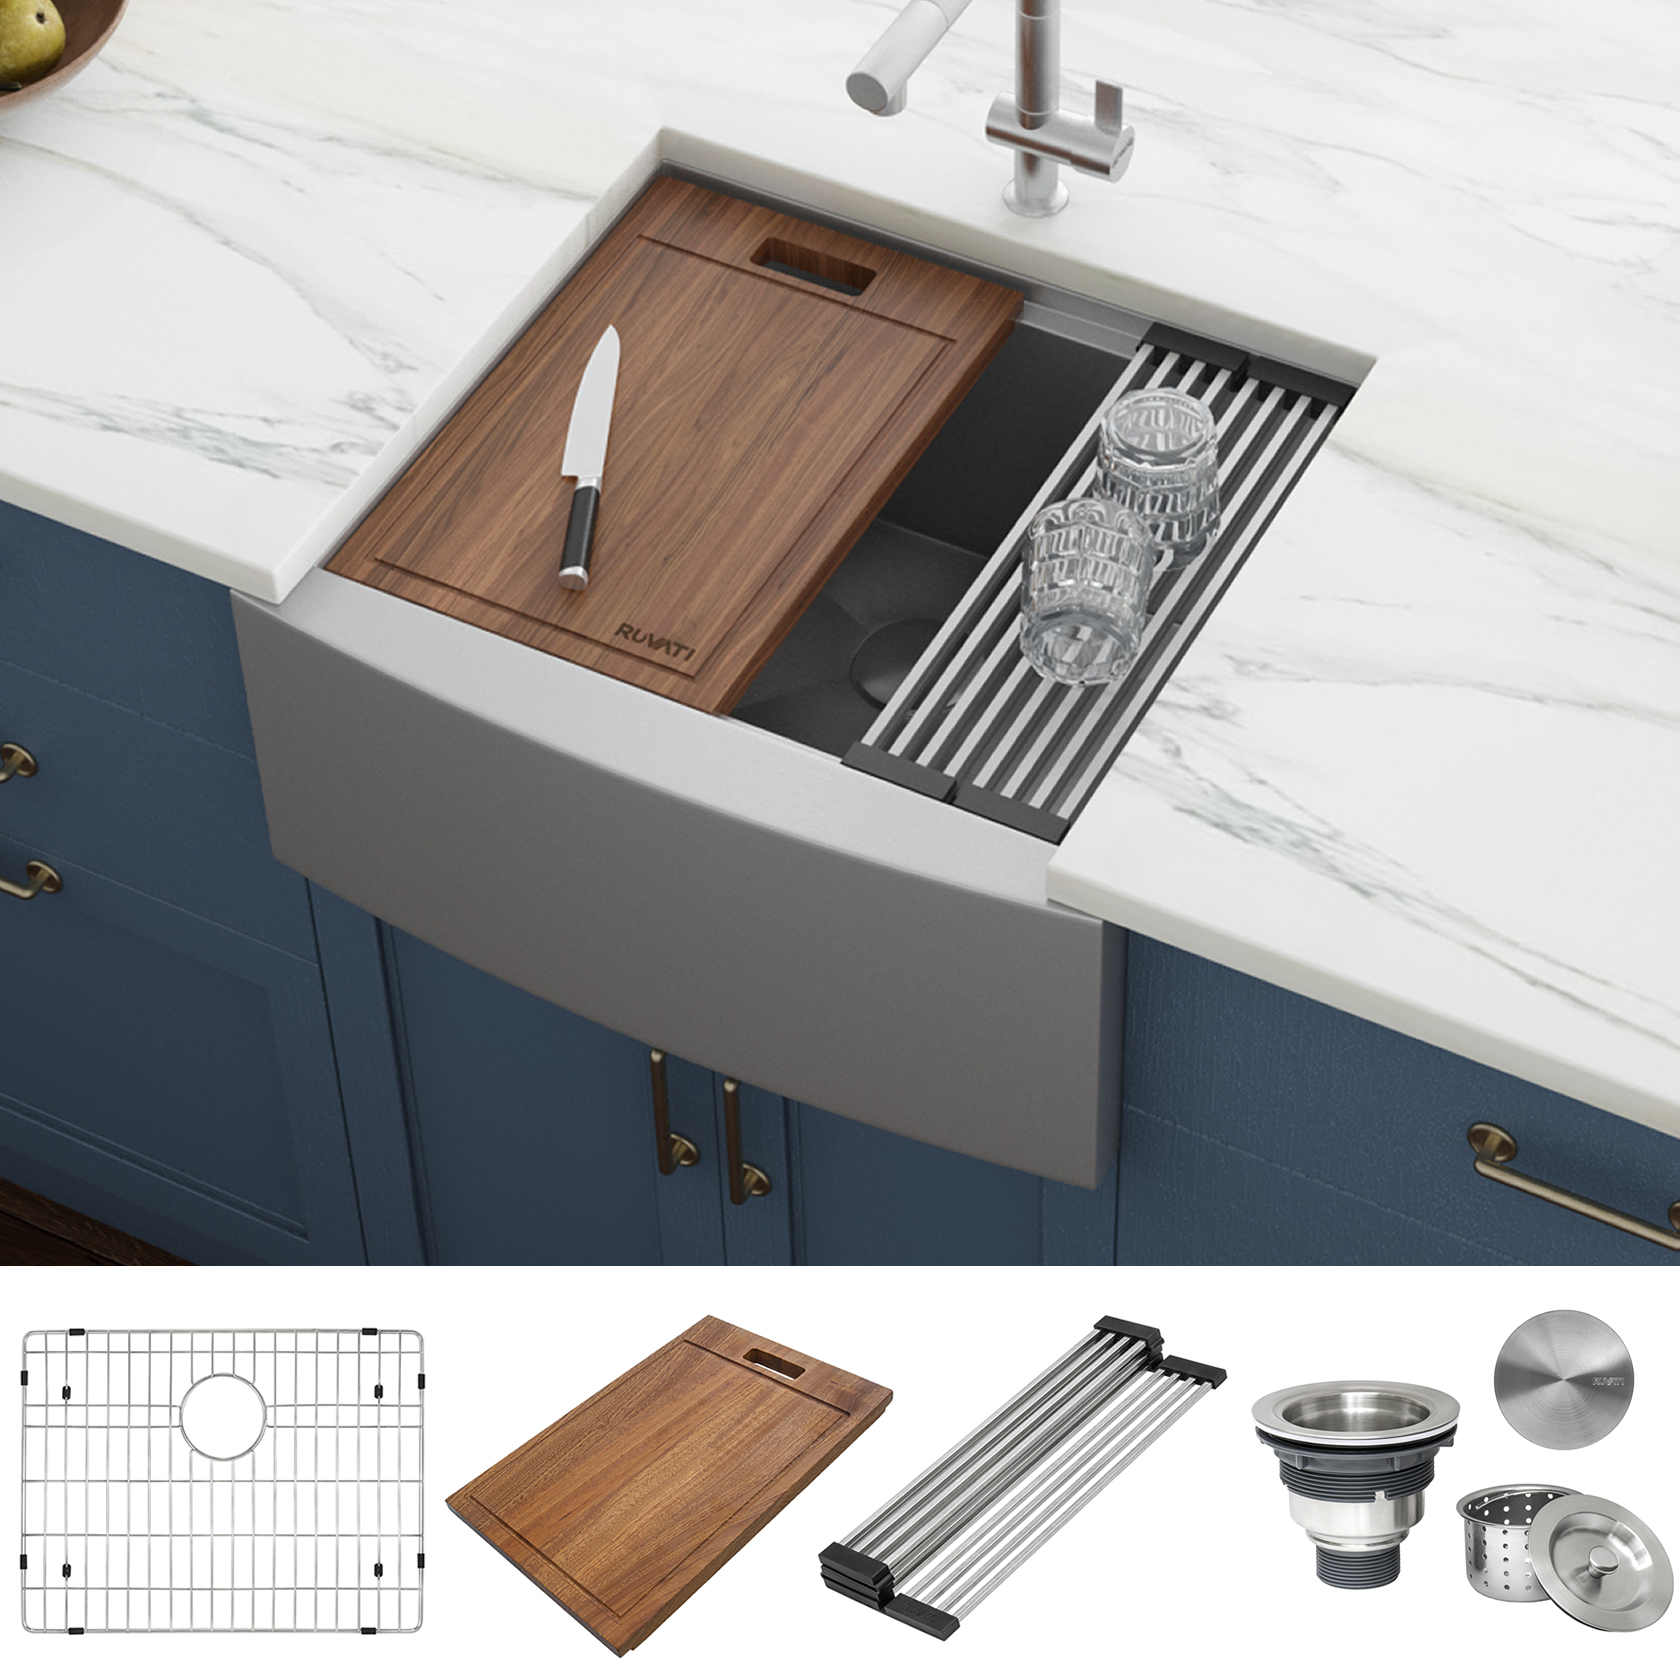 24 Inch Apron Front Workstation Farmhouse Kitchen Sink 16 Gauge Stainless Steel Single Bowl Ruvati Usa